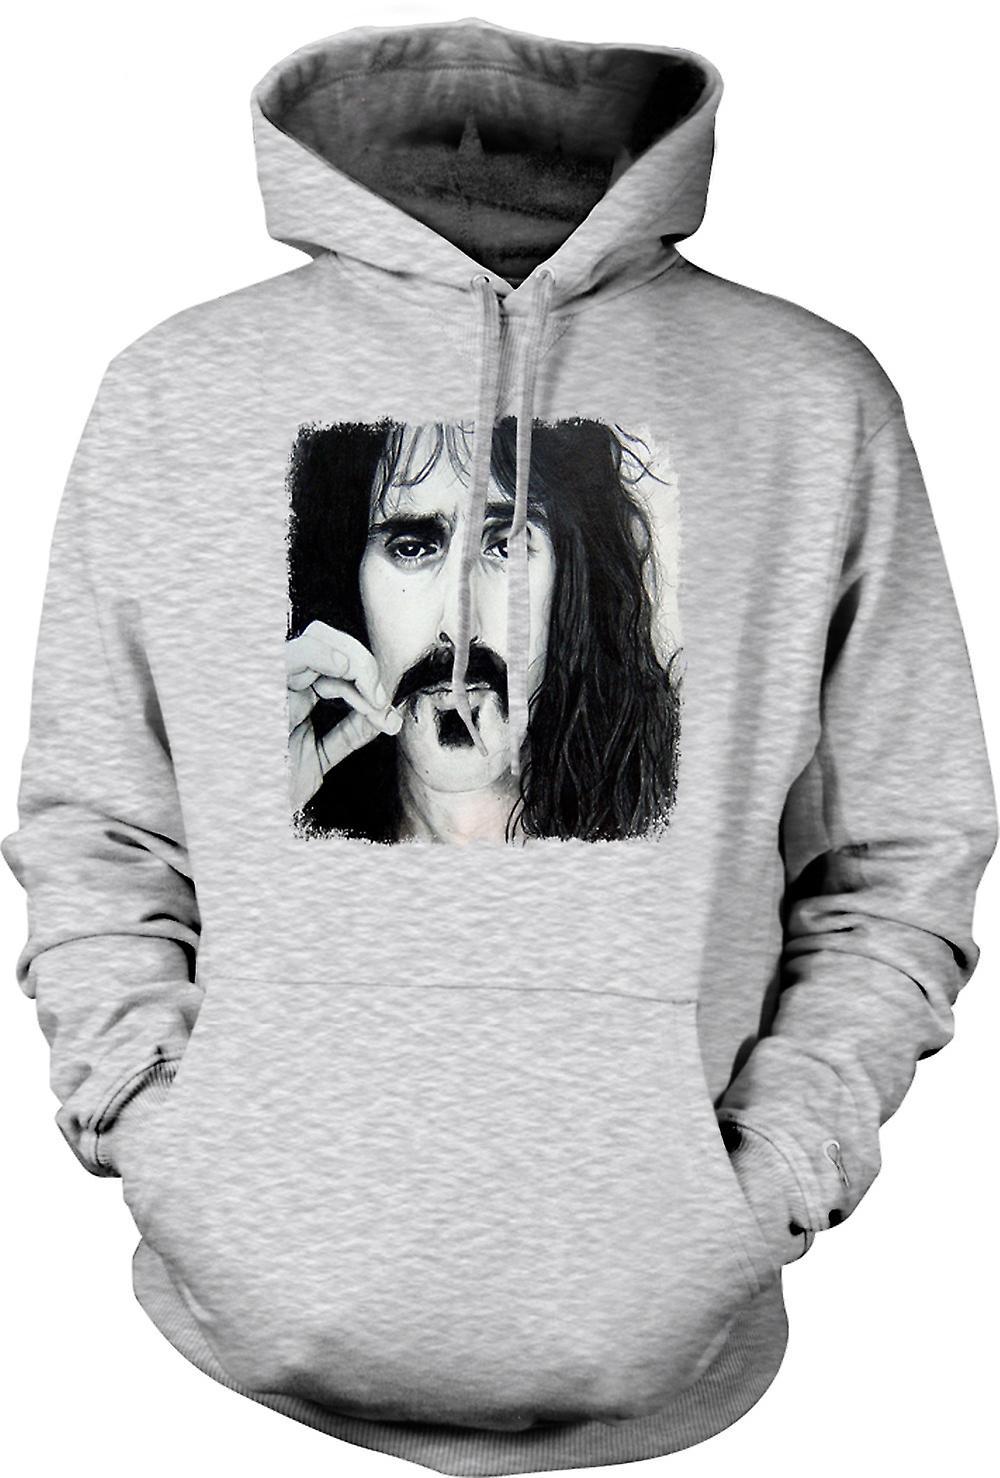 Mens Hoodie - Frank Zappa - porträtt skiss